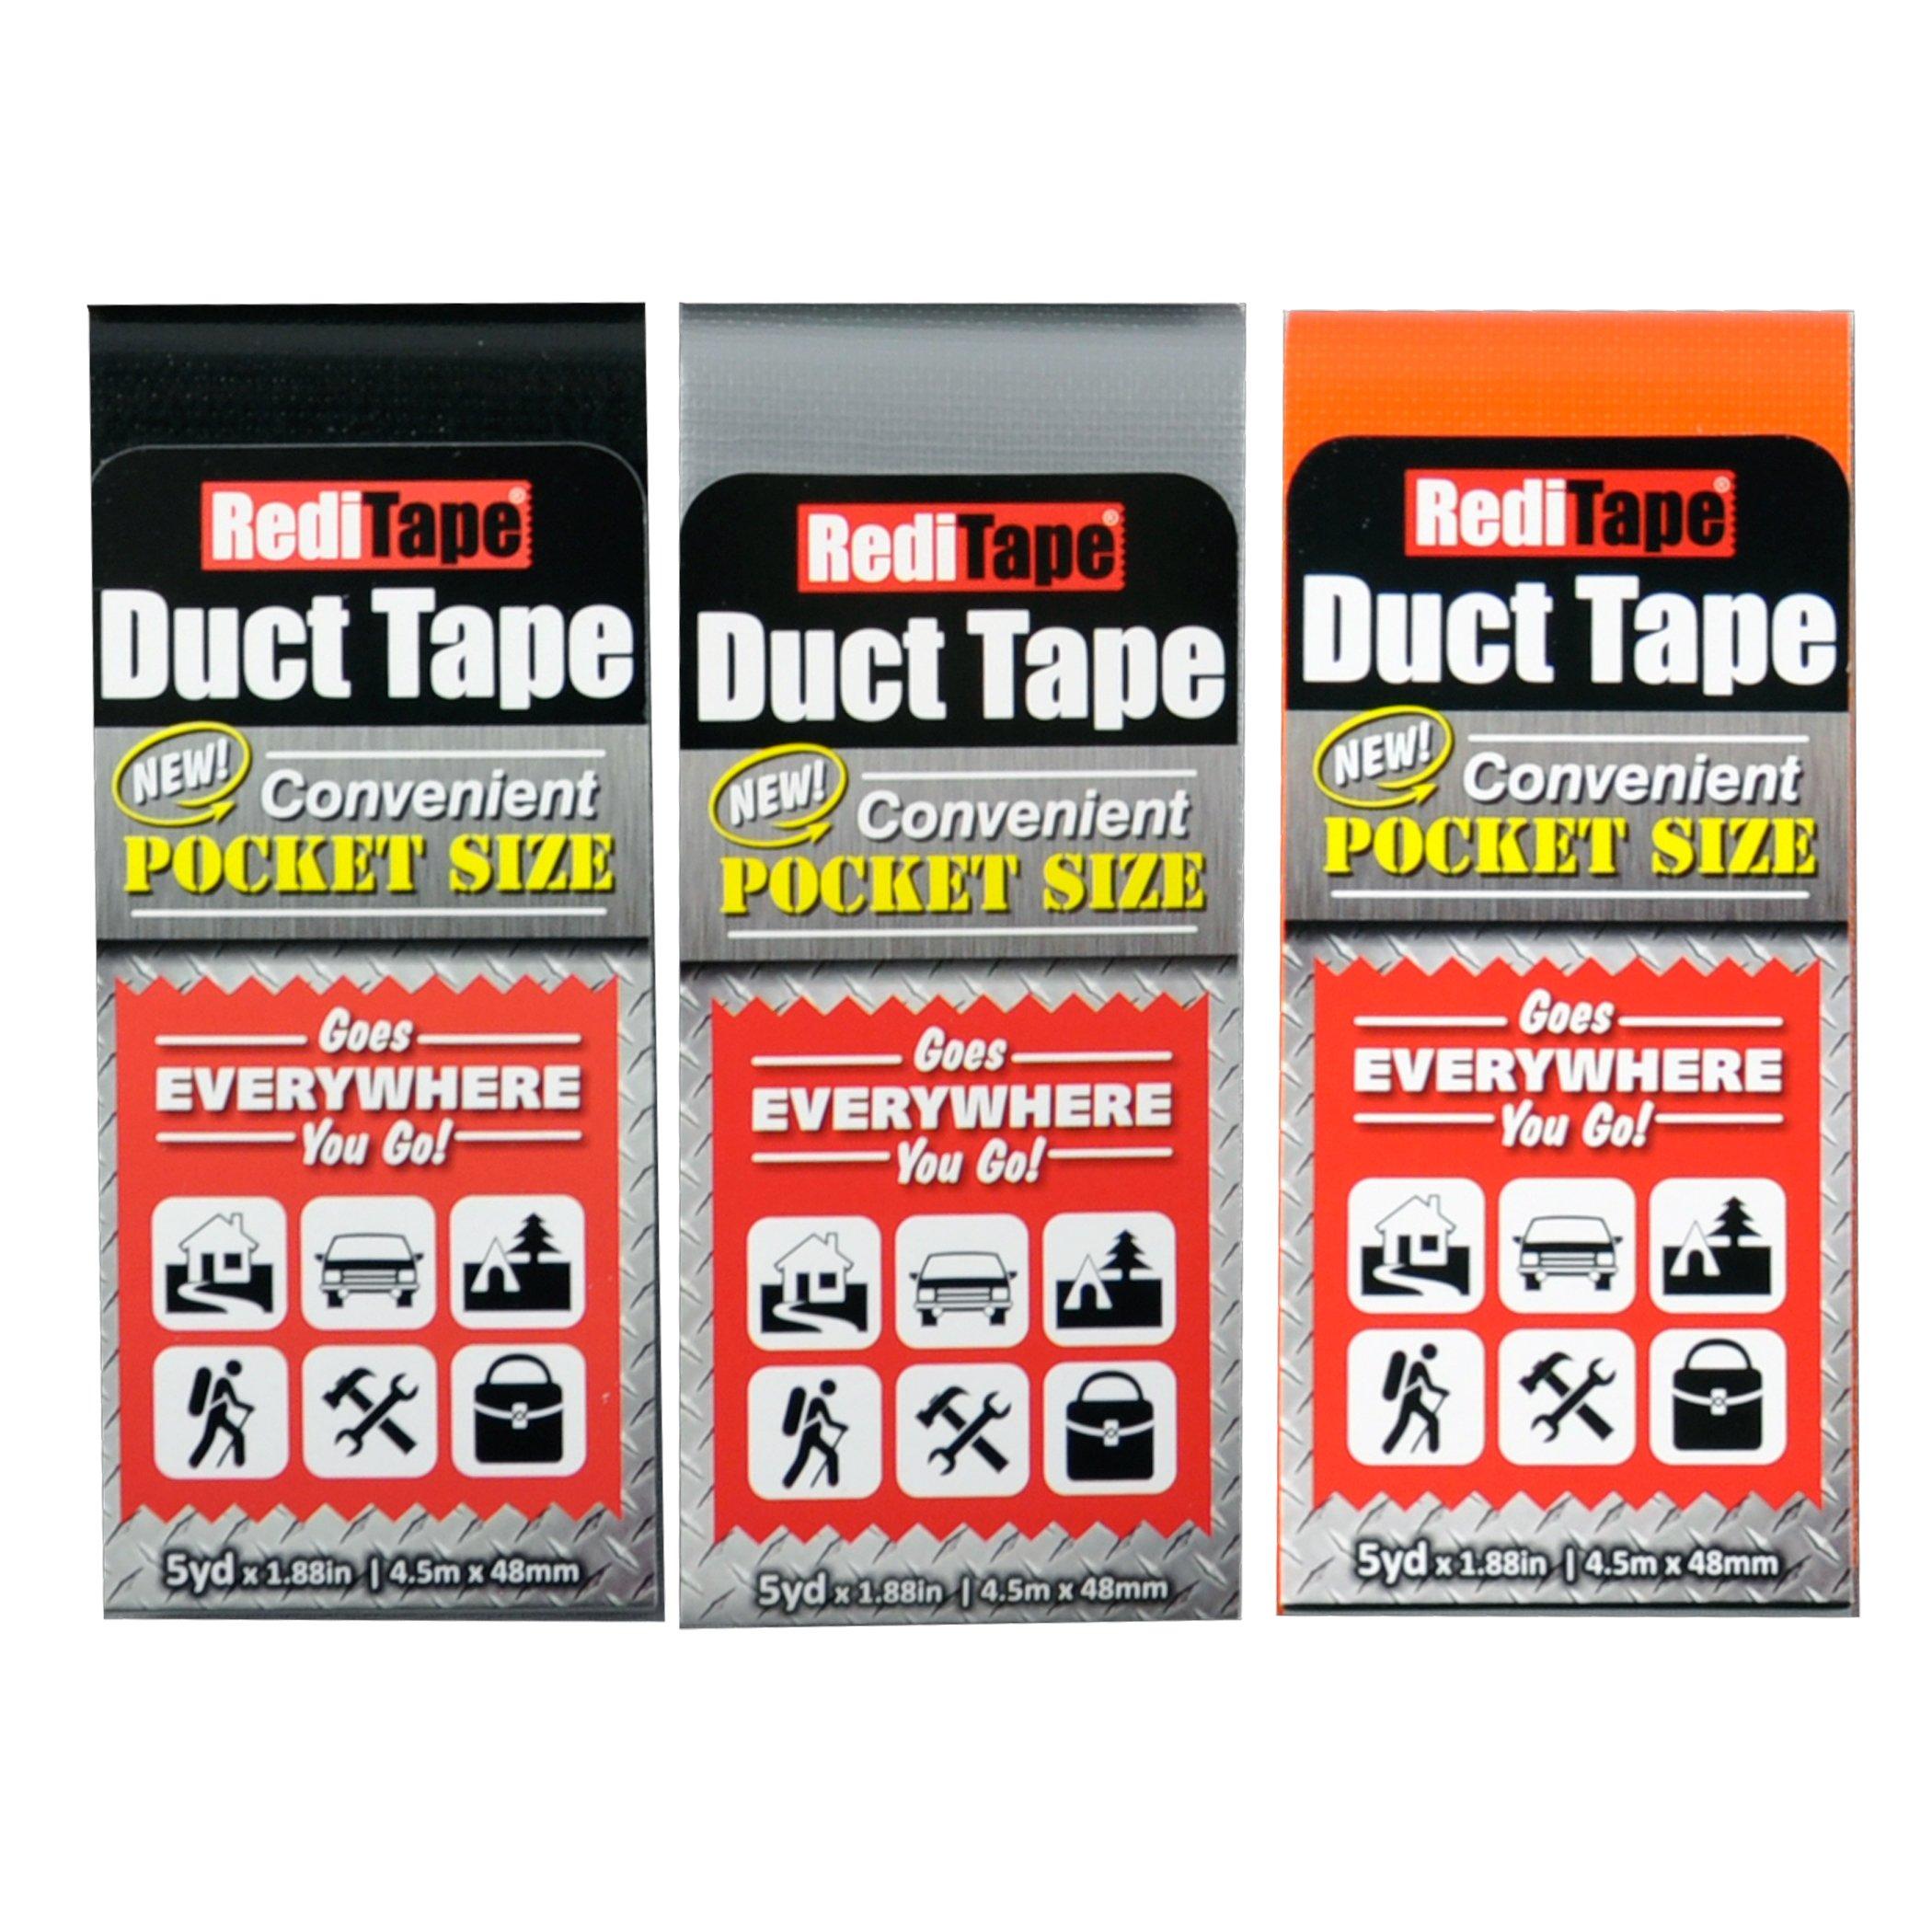 RediTape 10932 Duct Tape, 3-Pack, Black, Silver, Orange-10932